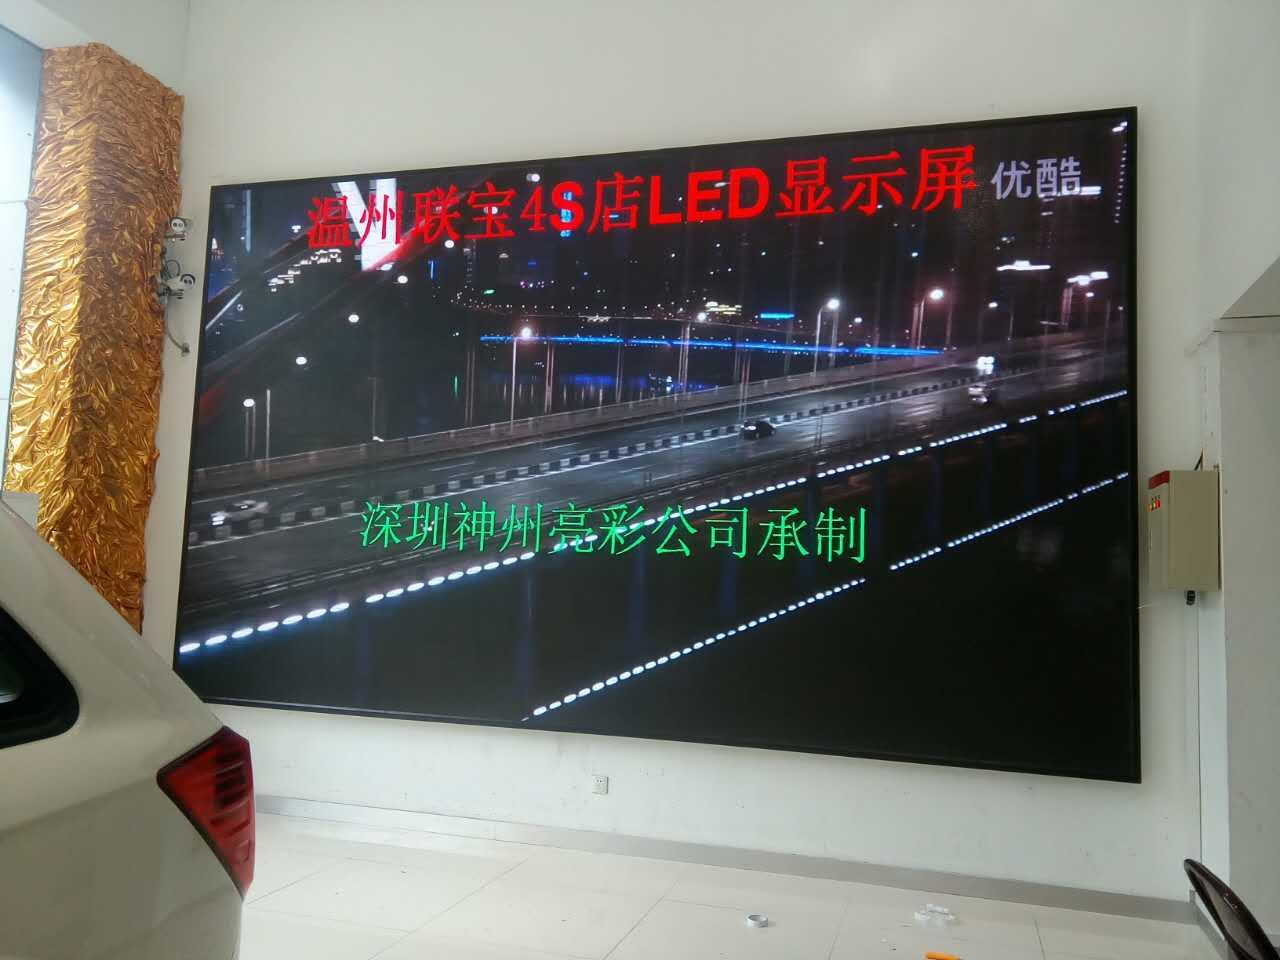 P3彩色LED屏批发-选购P3LED显示屏就找神州